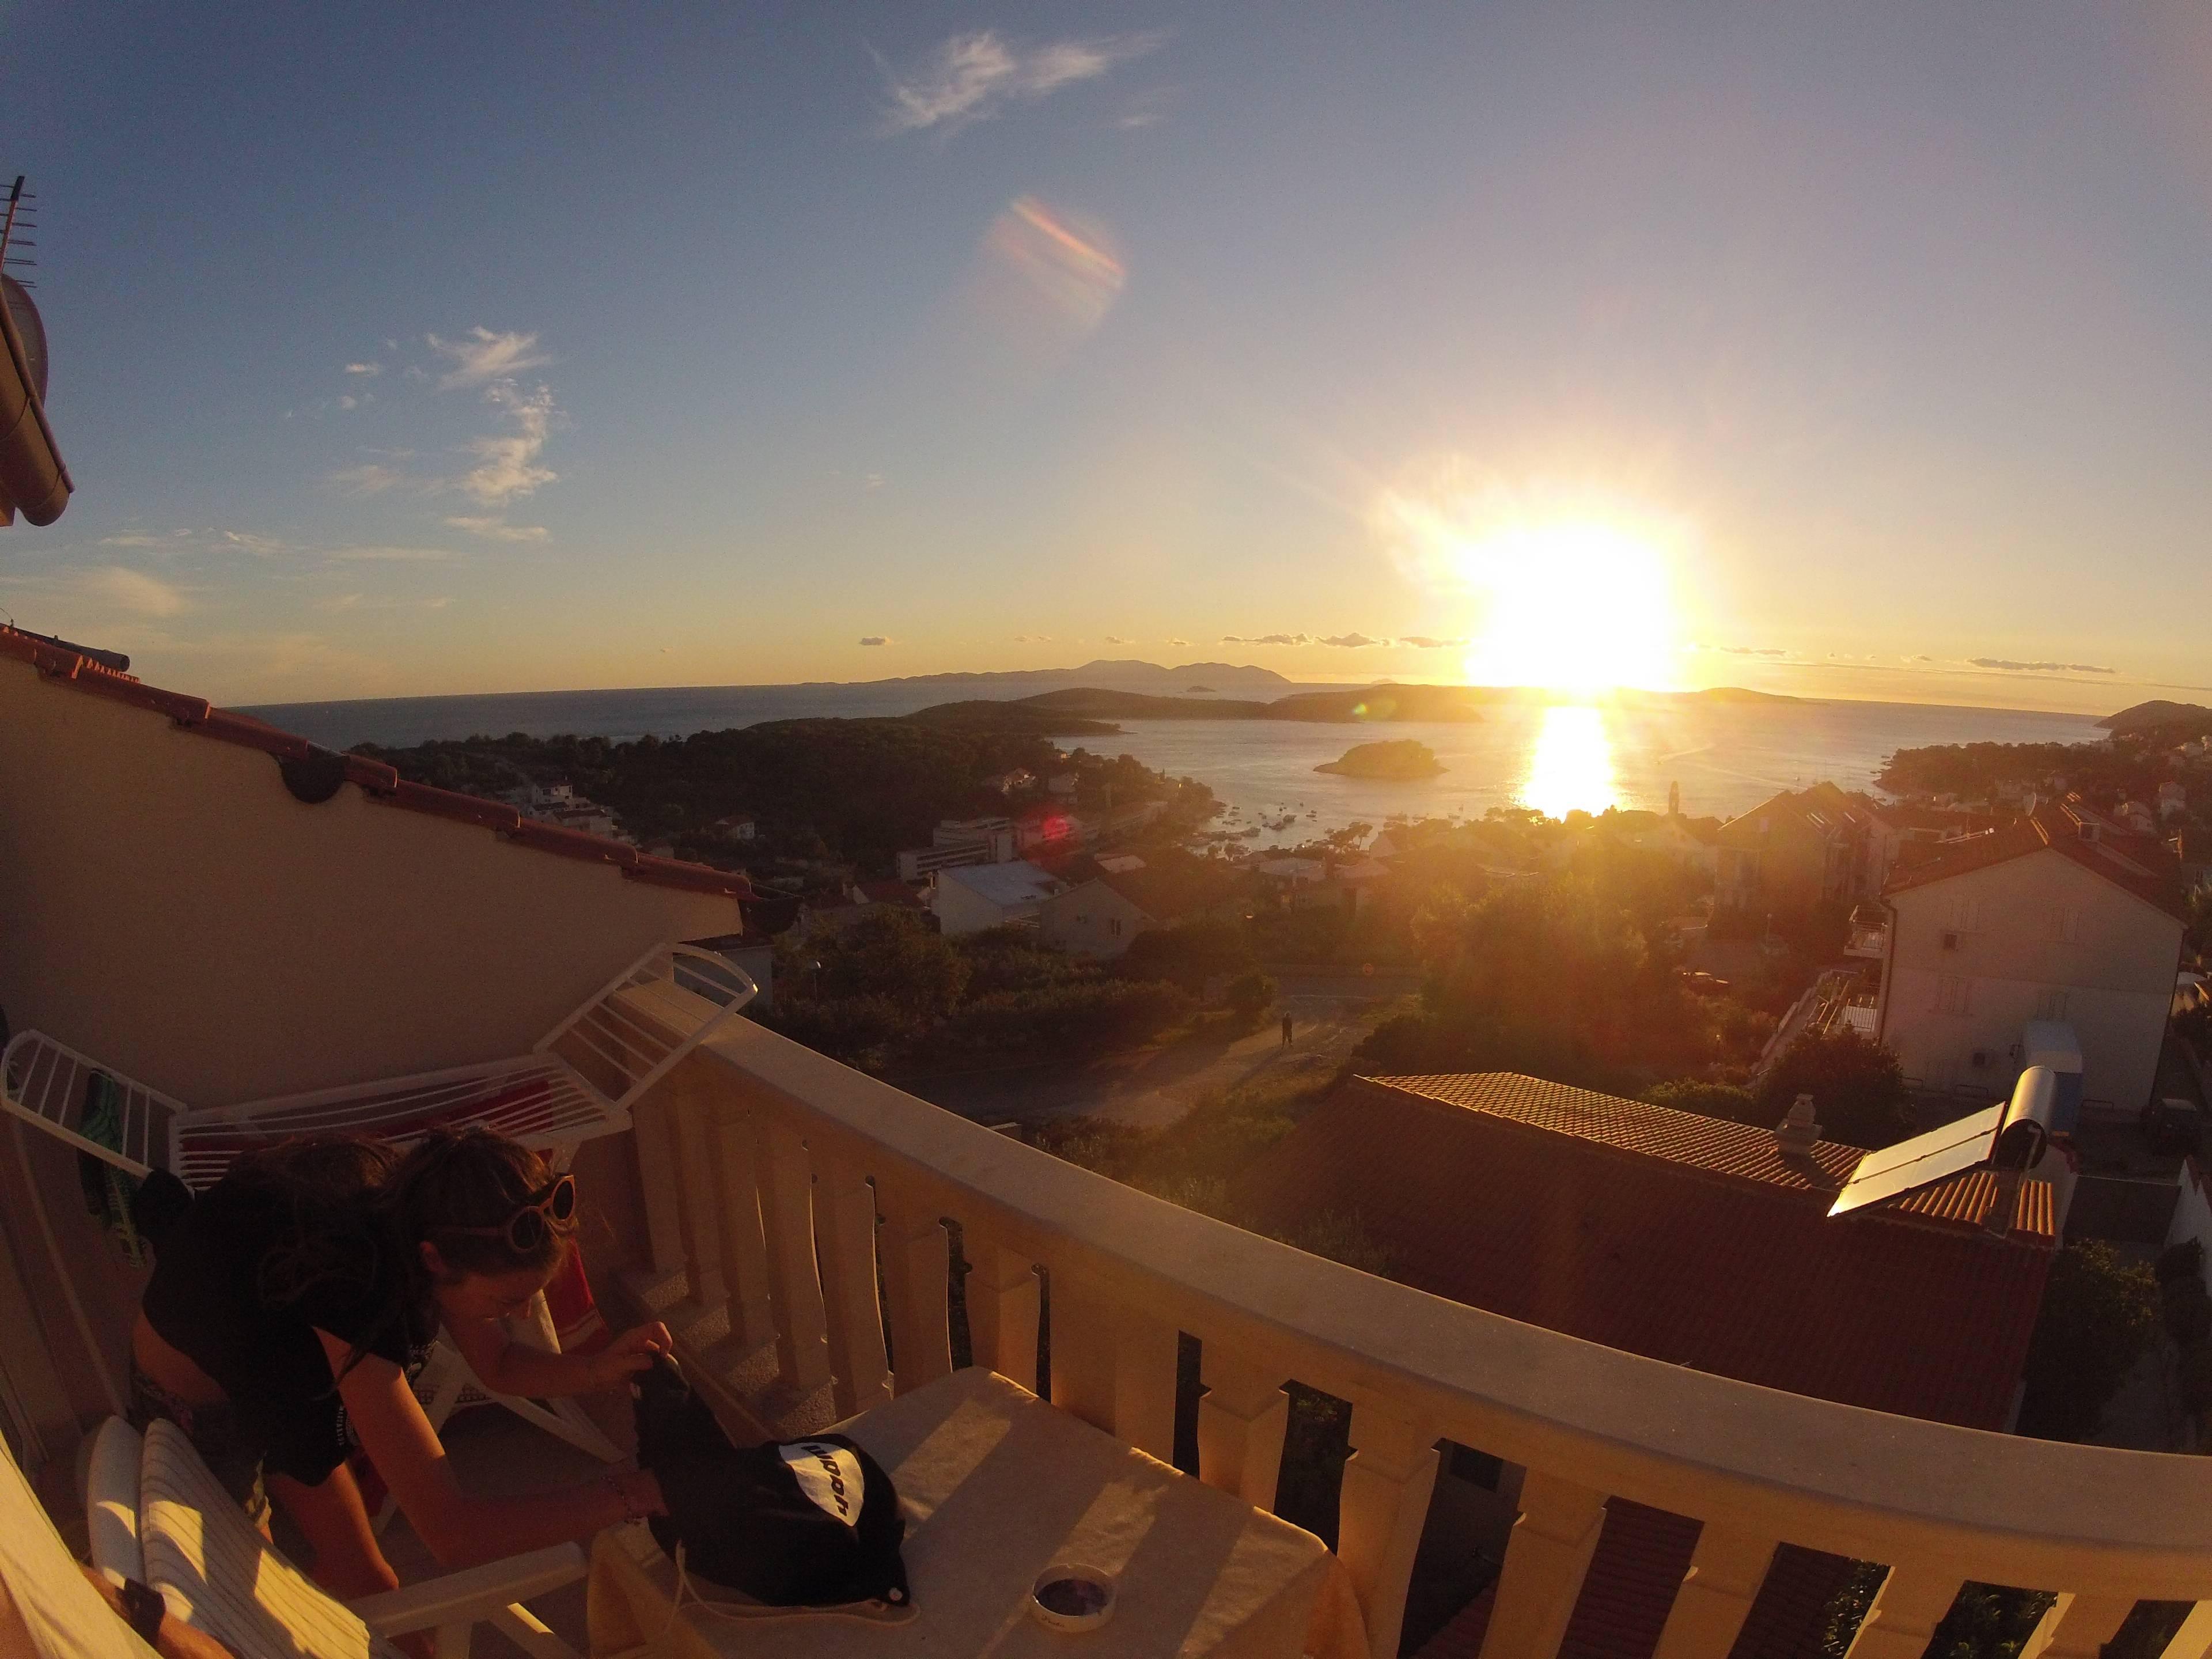 Photo 3: HVAR - PARADISE ISLAND